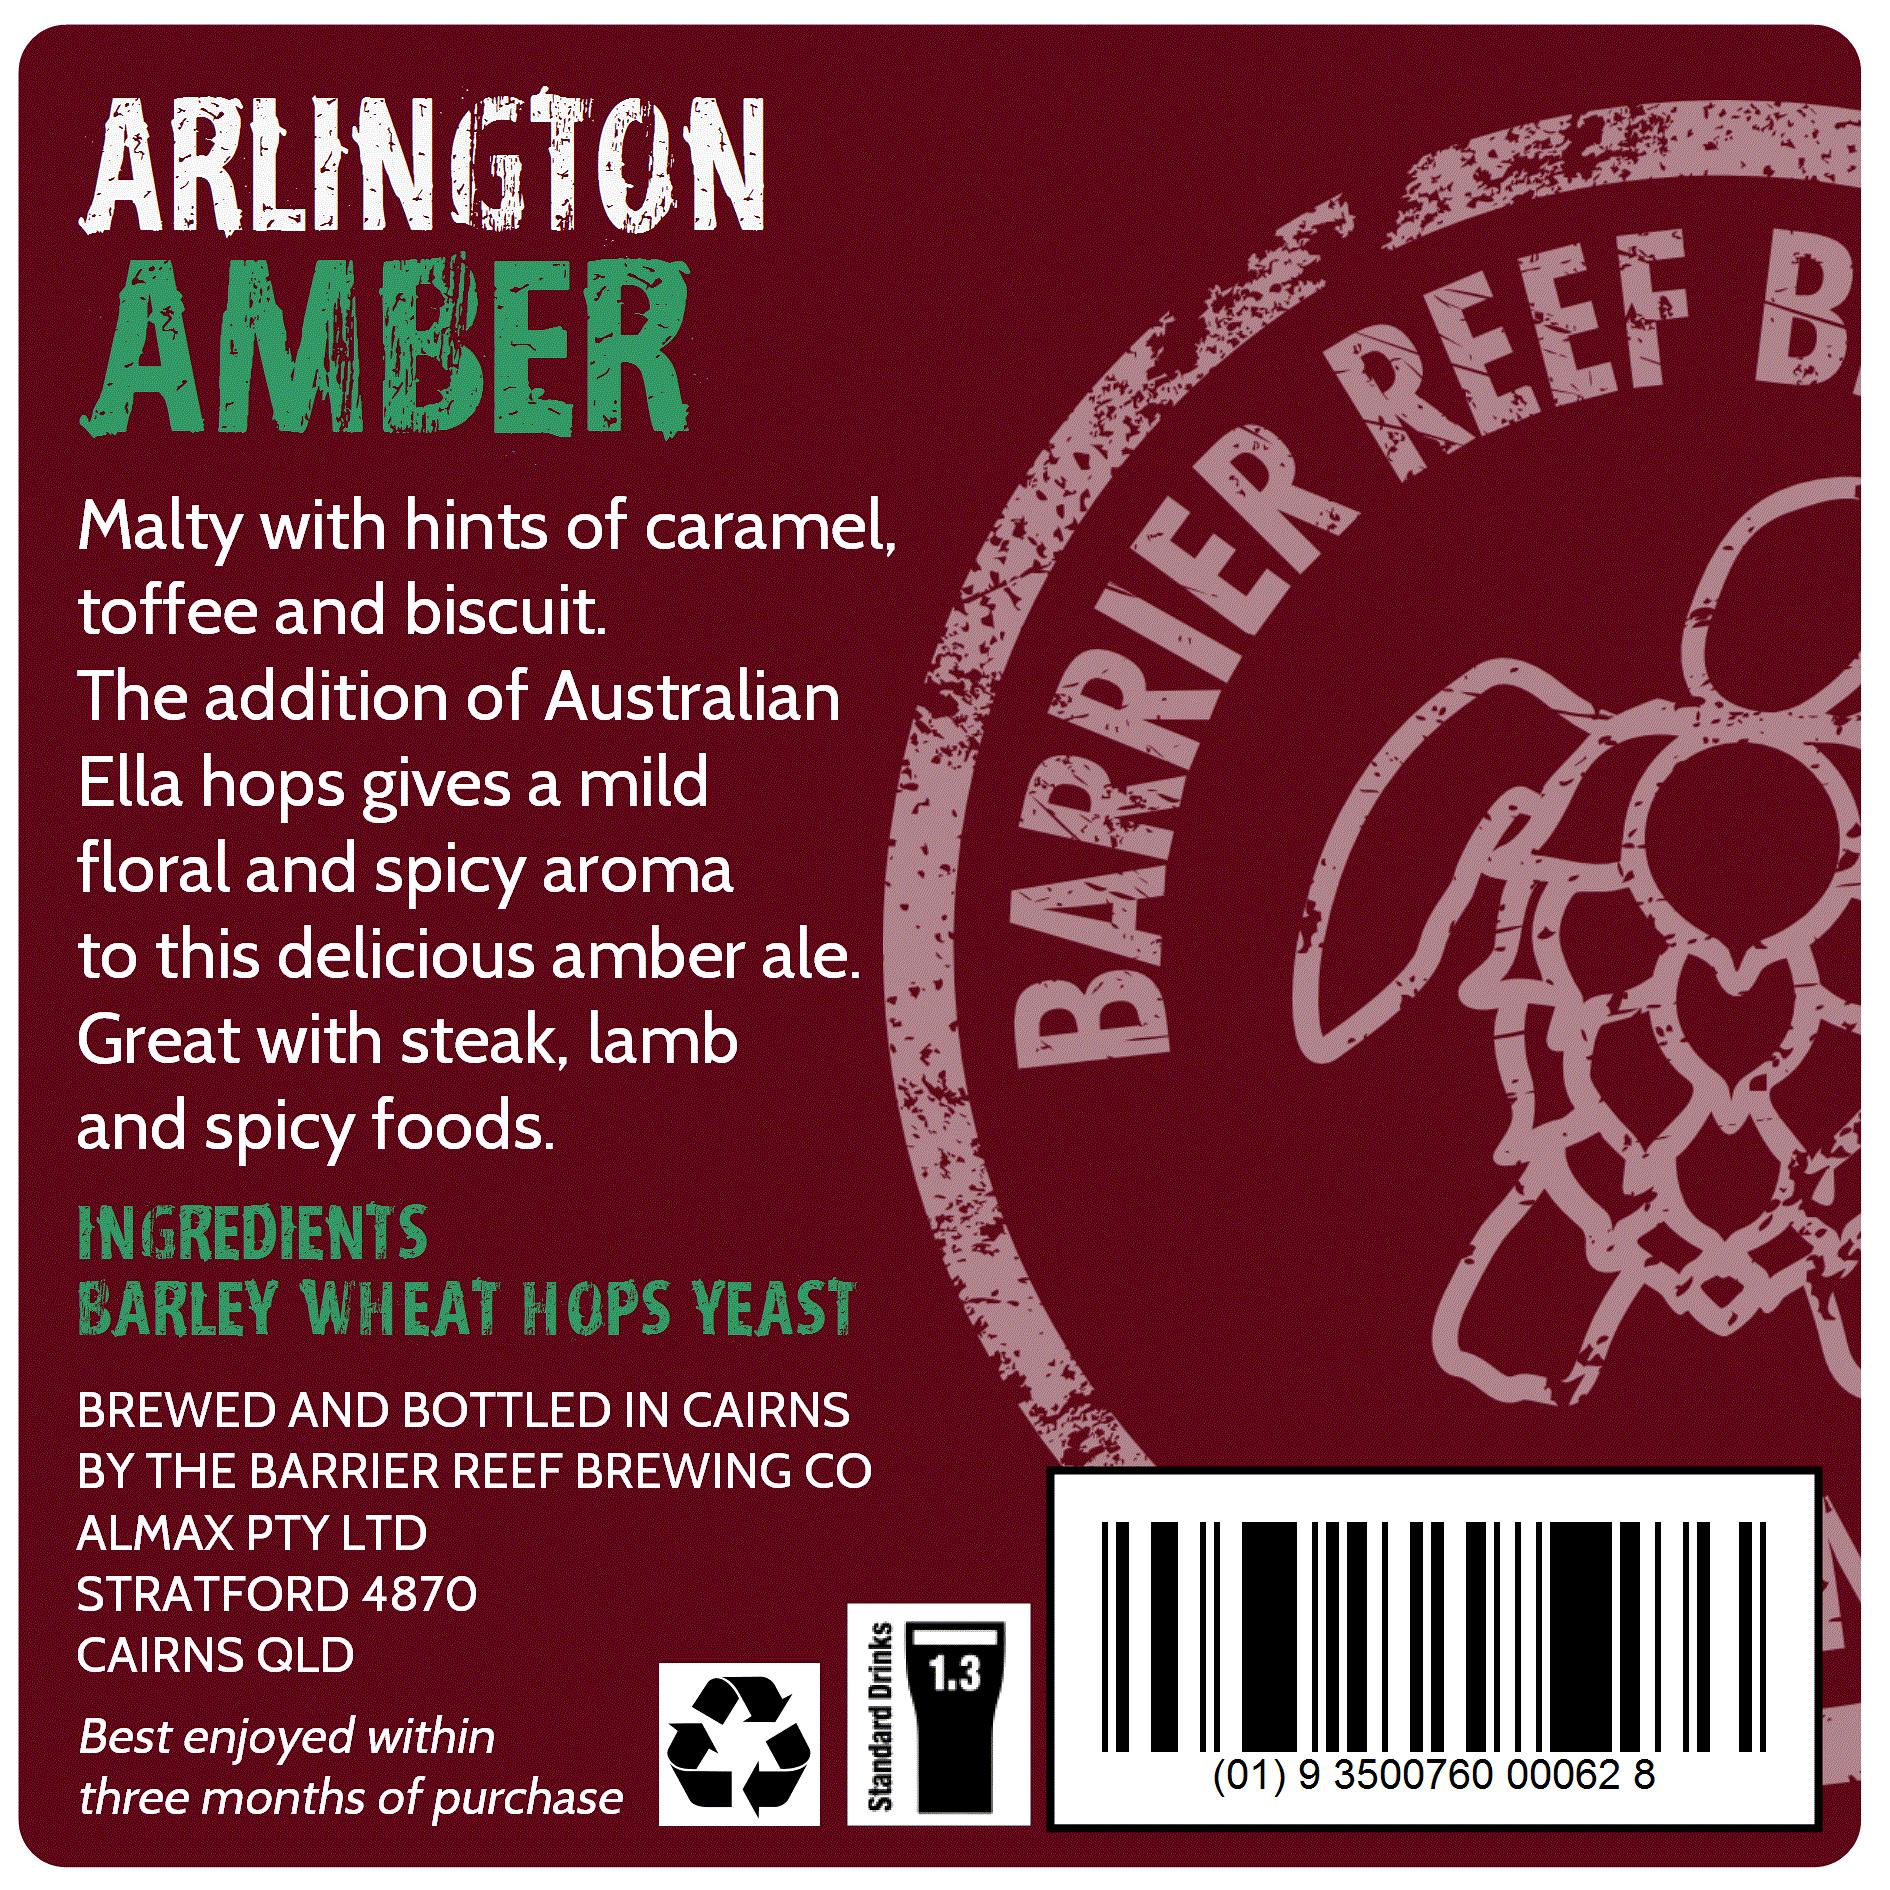 Arlington Amber Ale